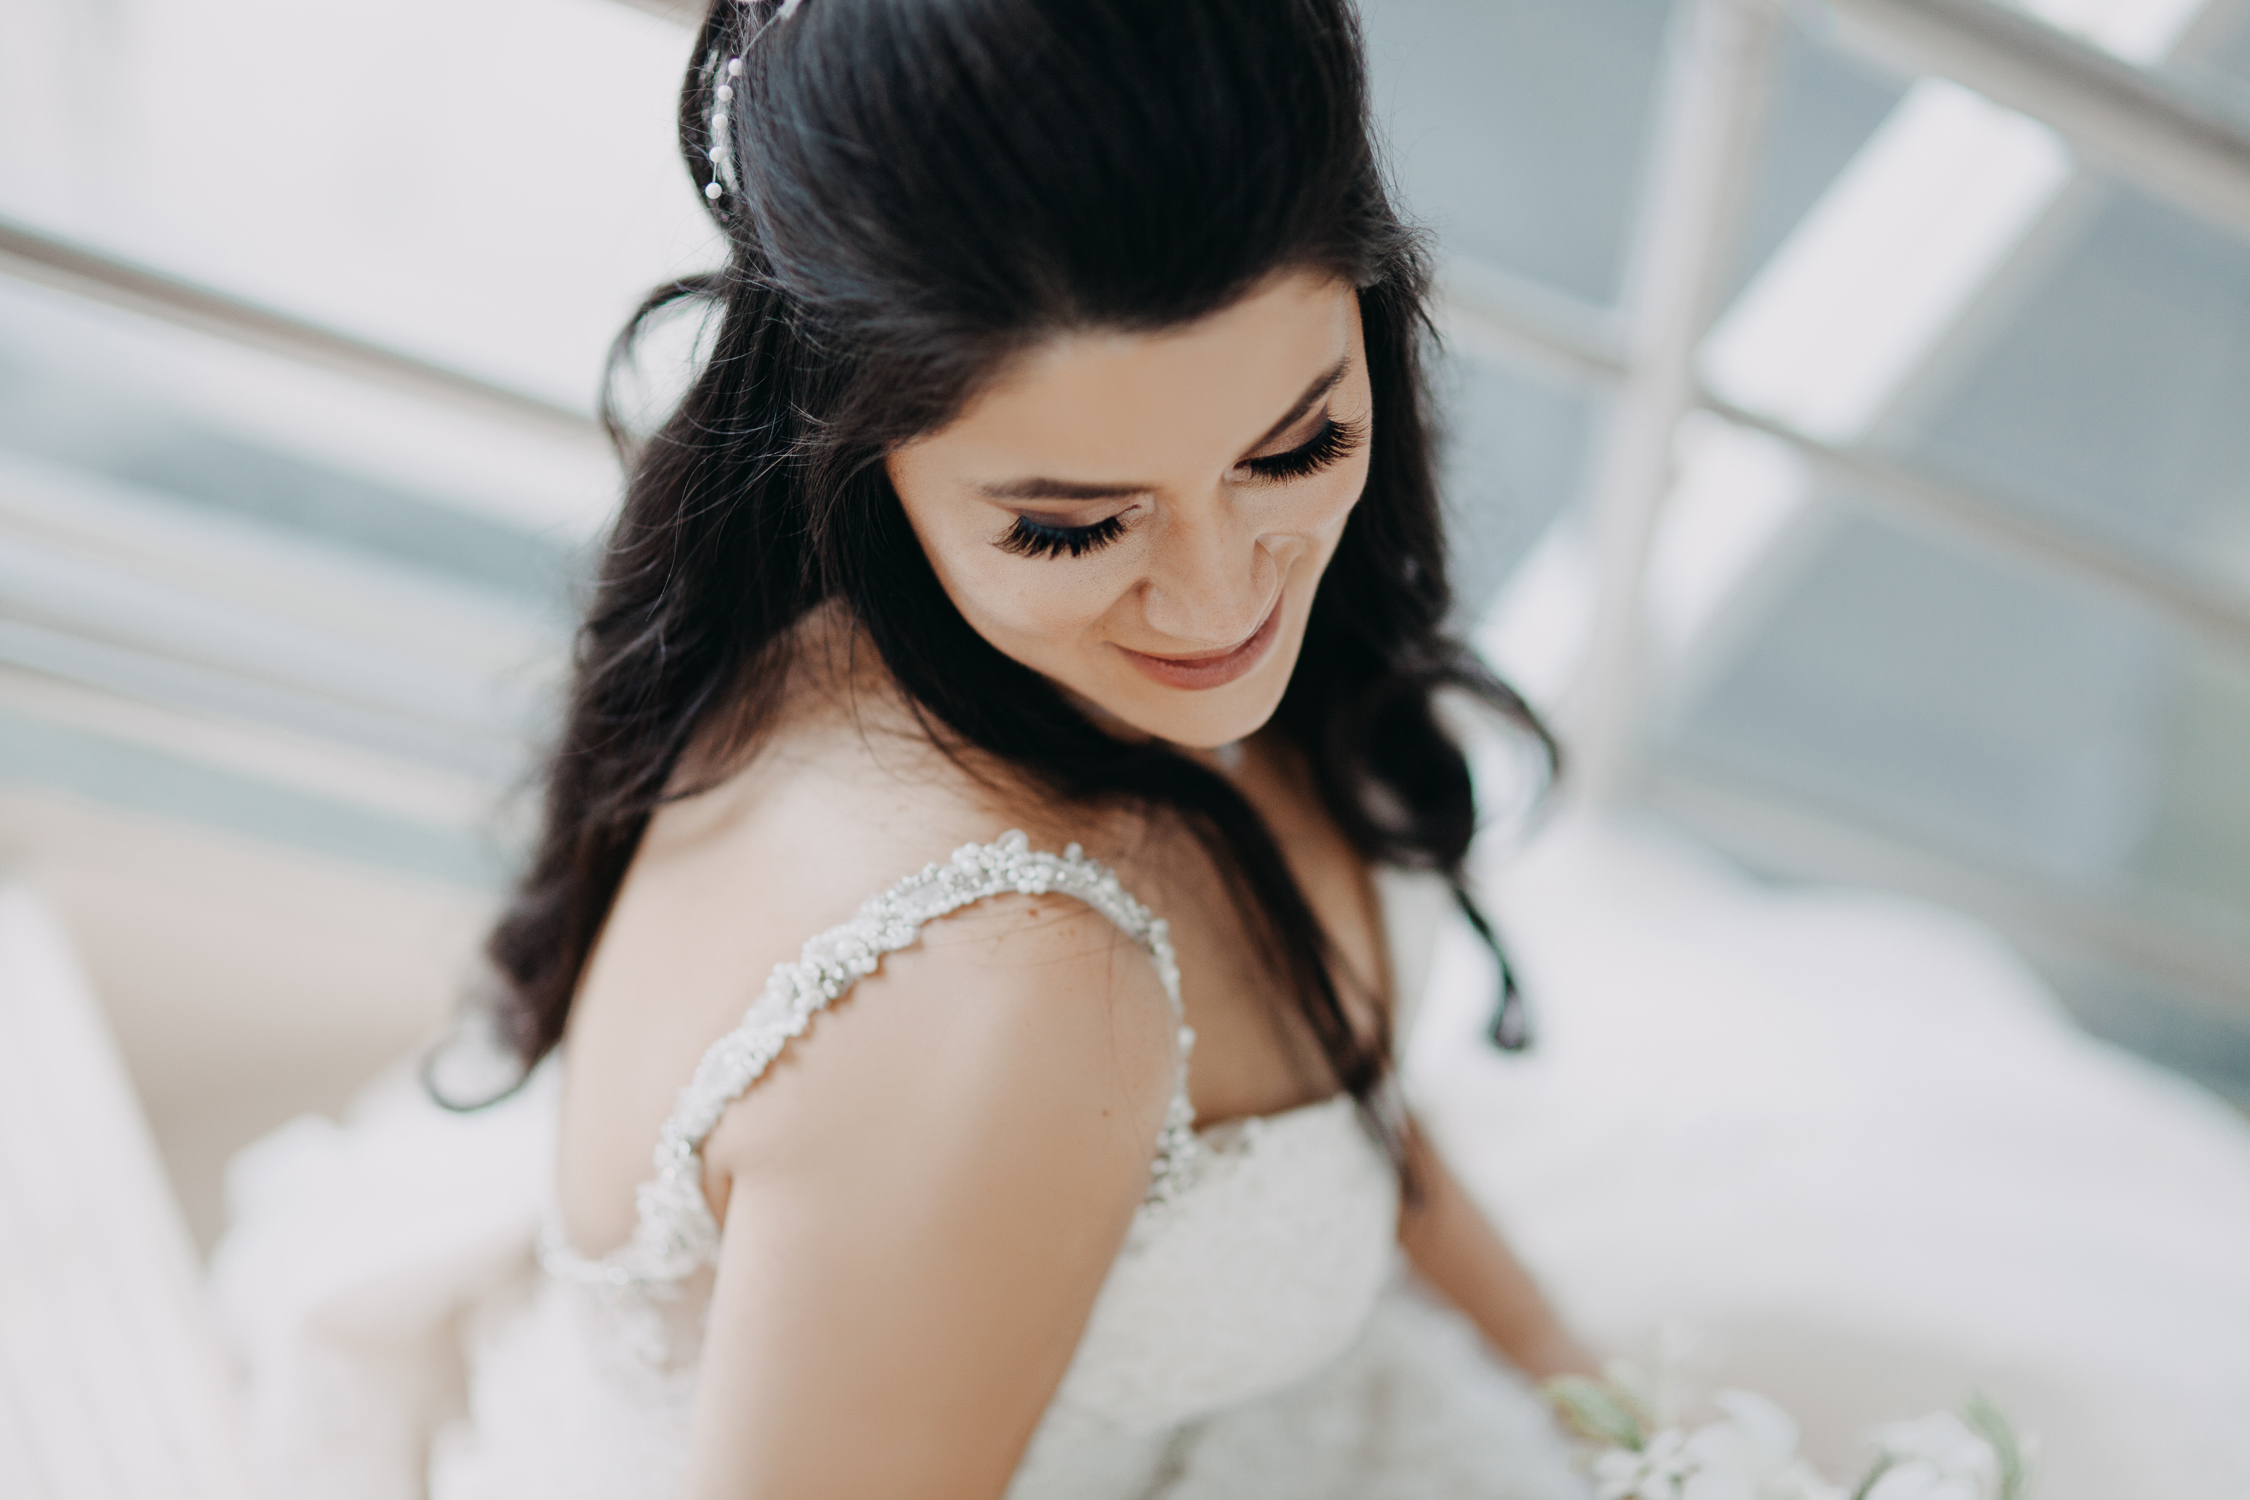 Michelle-Agurto-Fotografia-Bodas-Ecuador-Destination-Wedding-Photographer-Daniela-Dirk-80.JPG